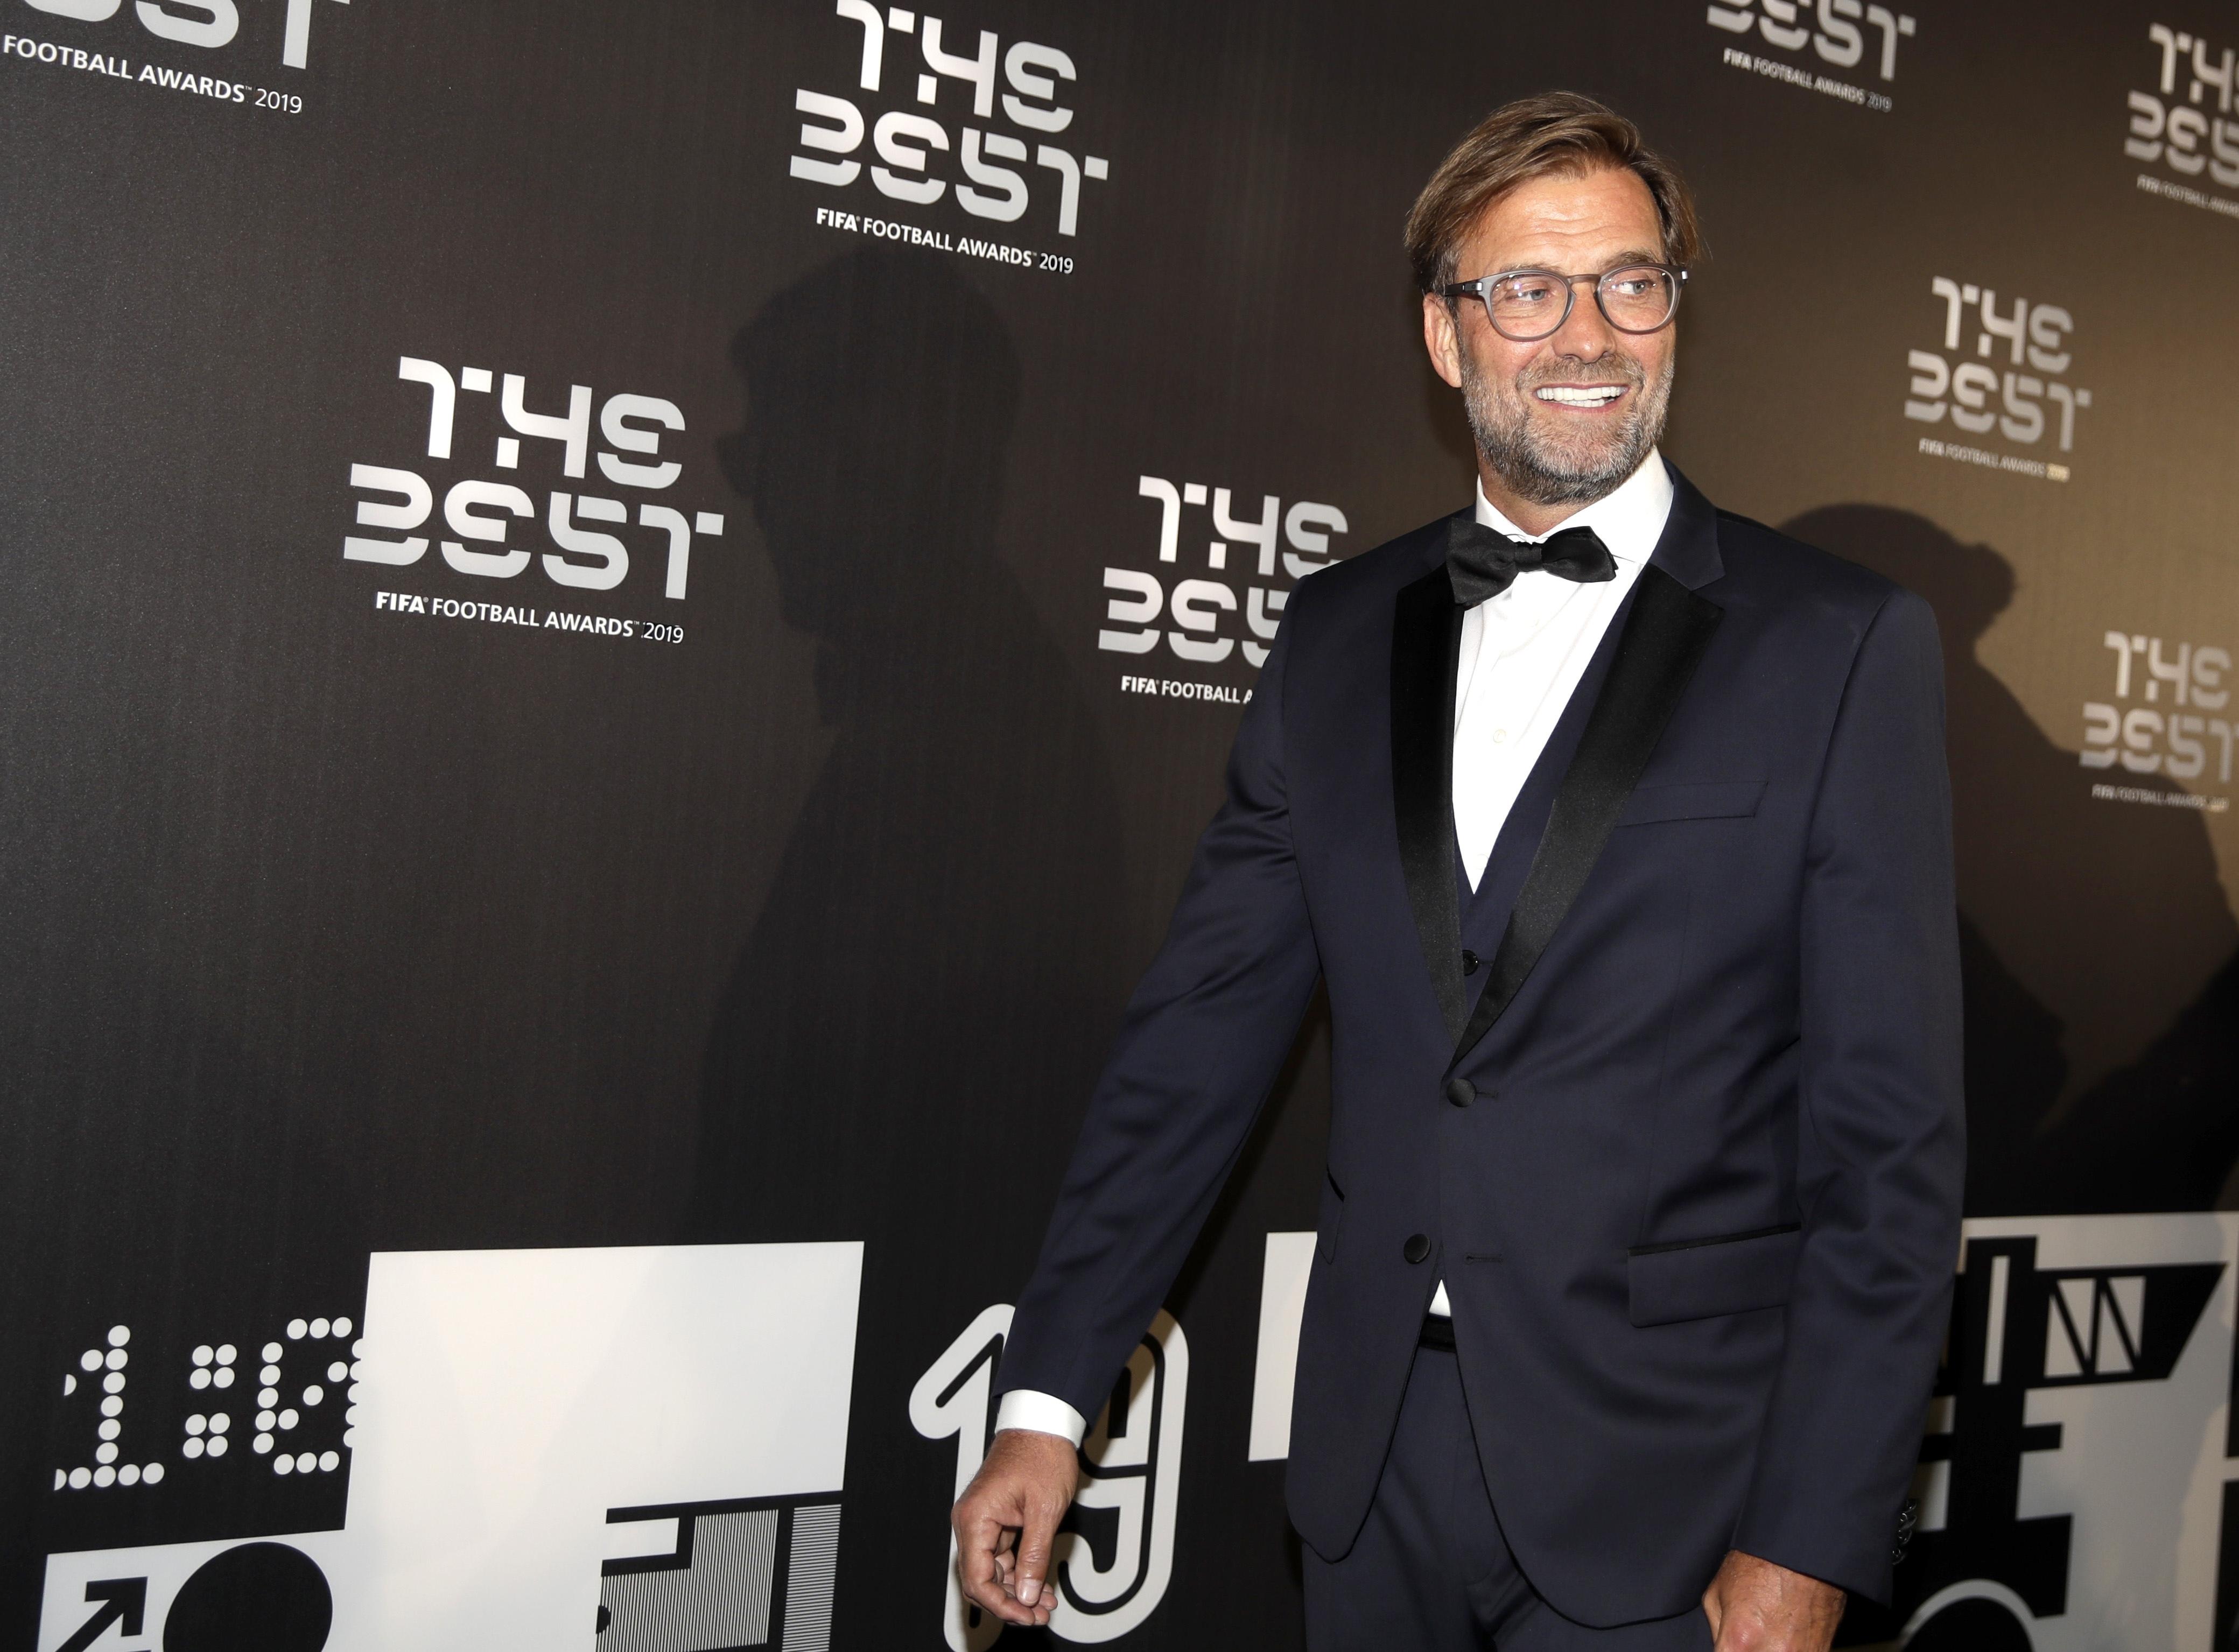 The Latest: Rapinoe wins FIFA player of the year award